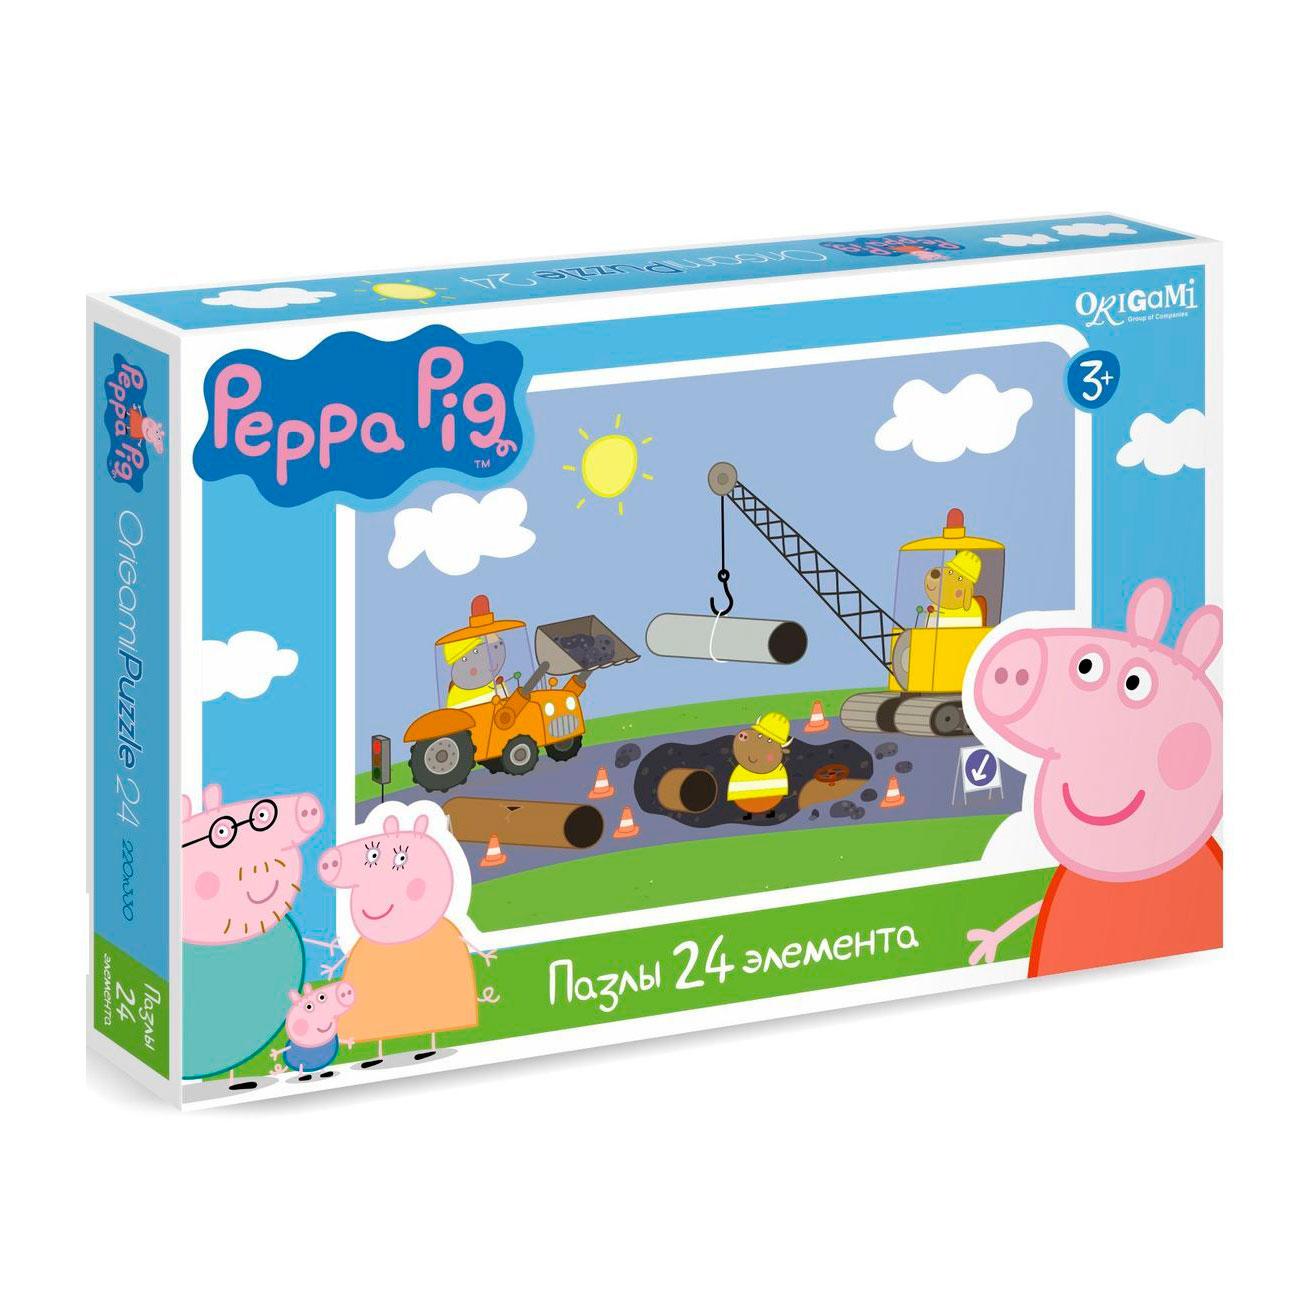 Пазл Origami Peppa Pig 1569<br>